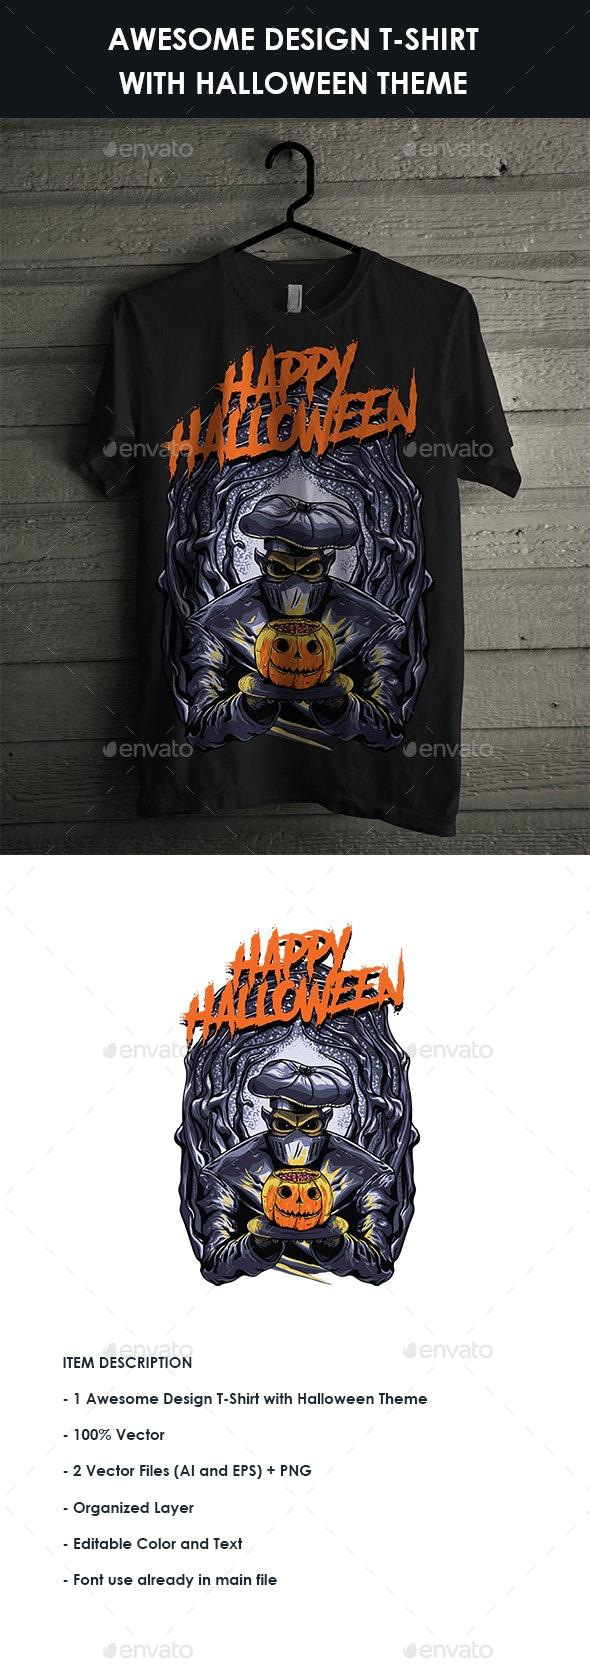 T-Shirt with Halloween Theme